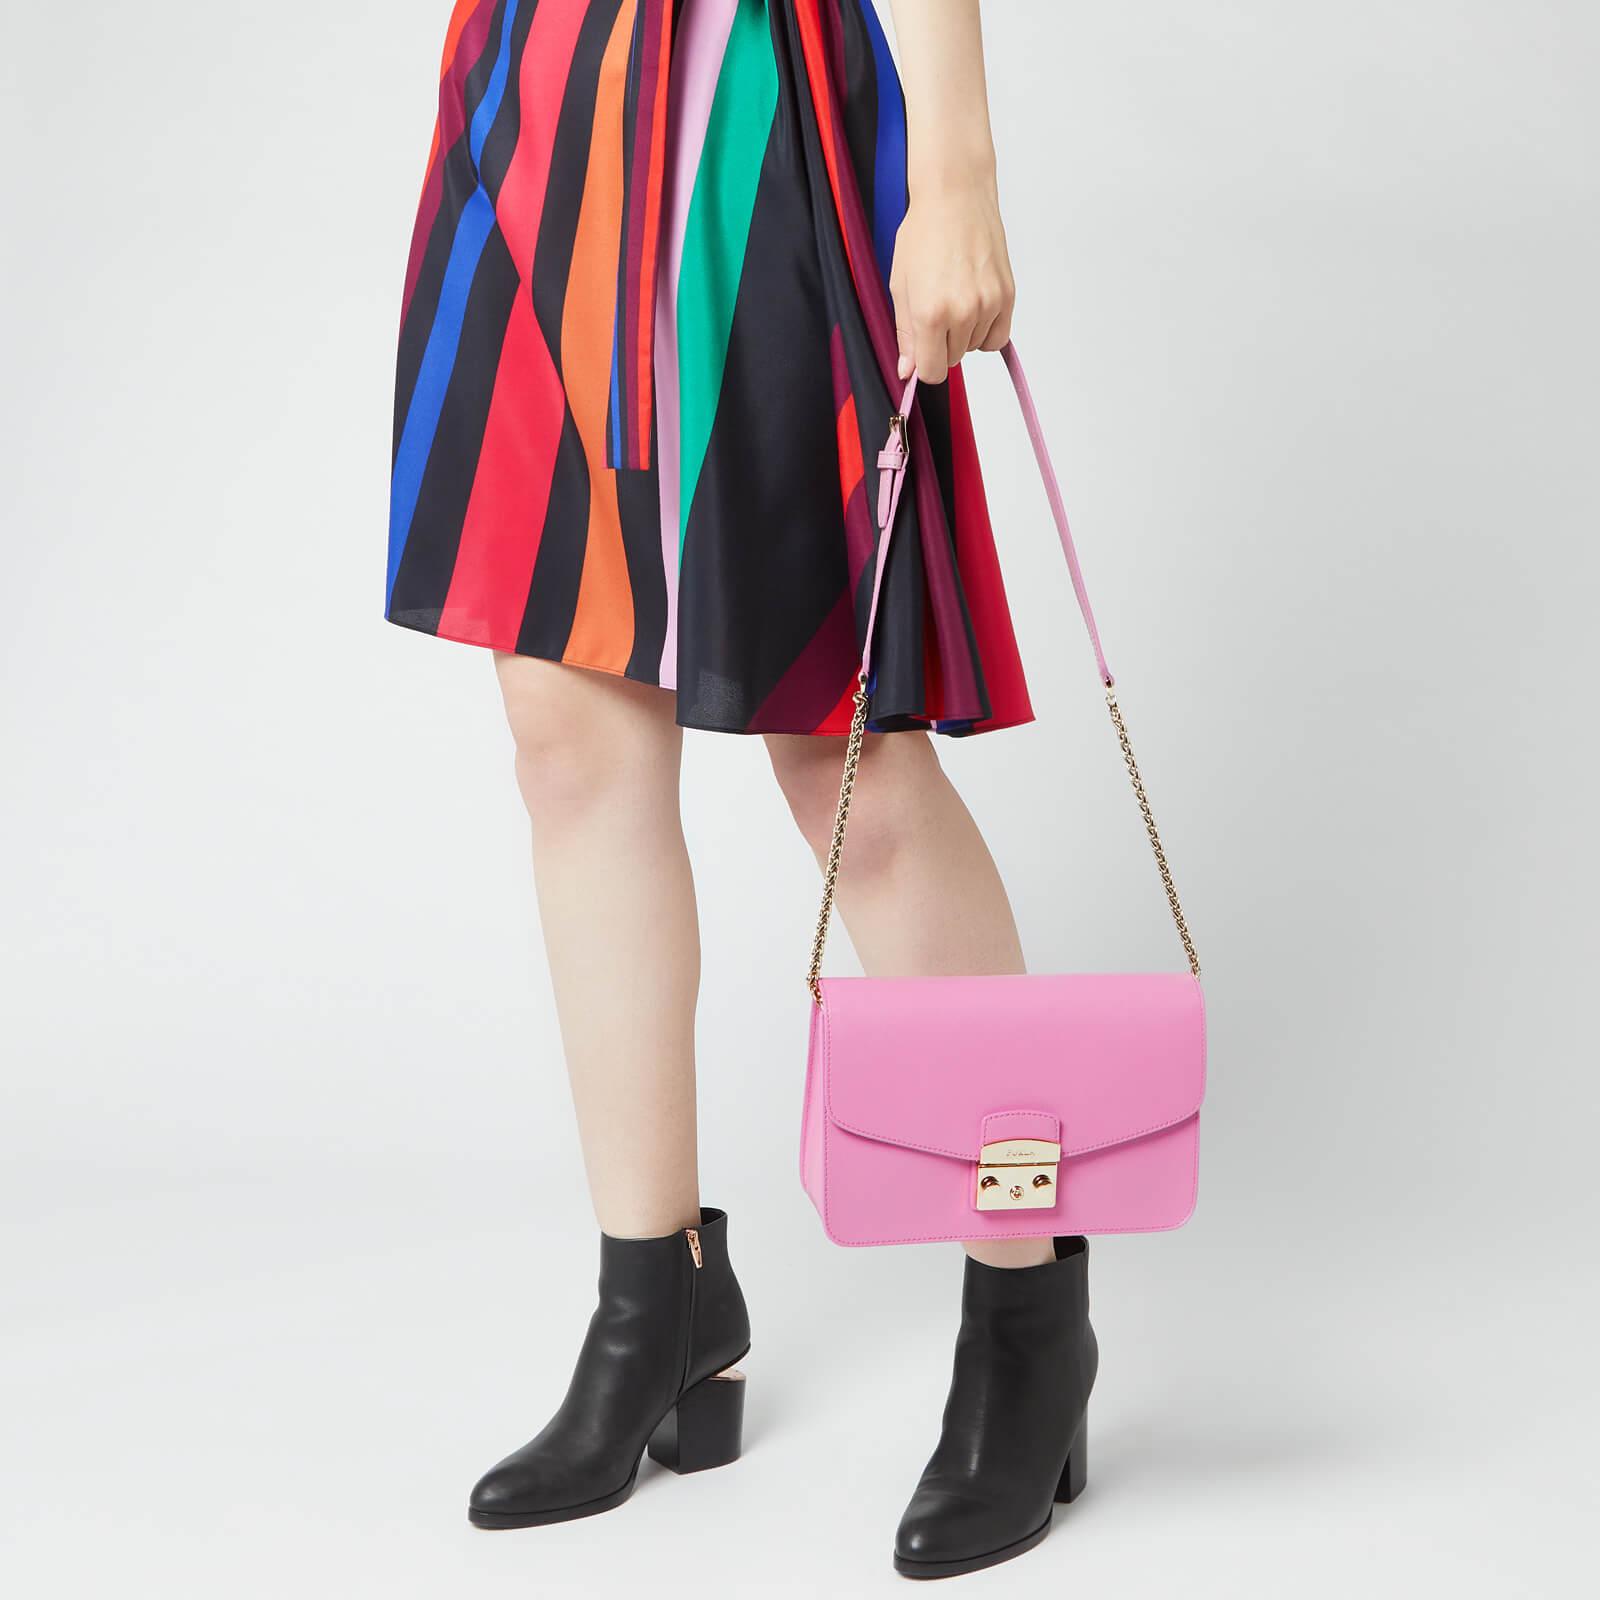 Furla Women's Metropolis S Shoulder Bag - Malva G